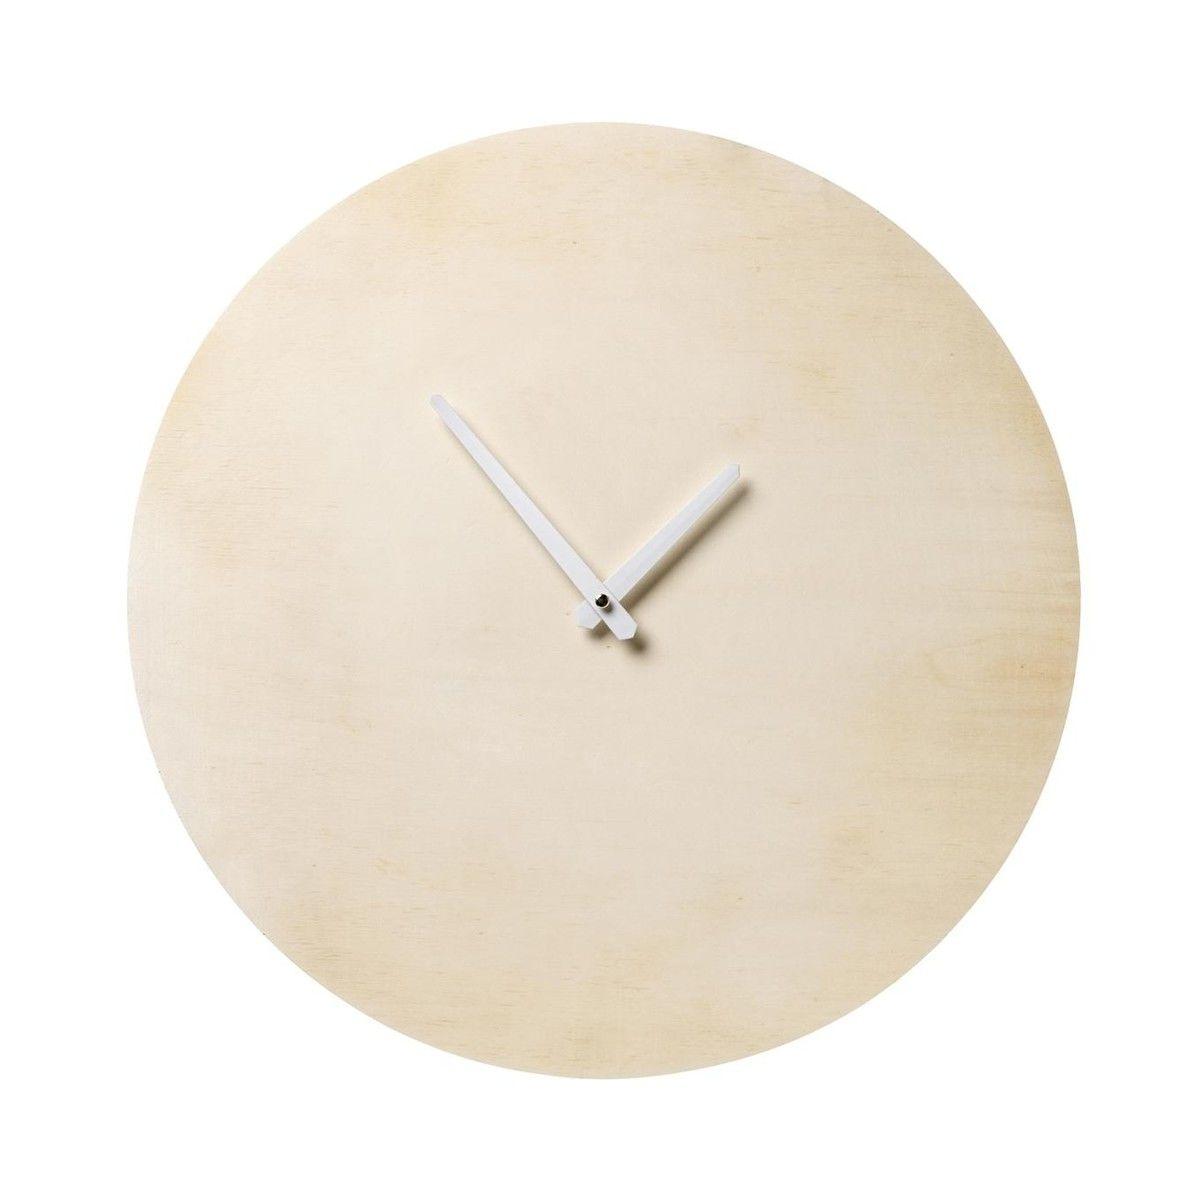 Paulownia wall clock 25cm bloomingville ambientedirect bloomingville paulownia wall clock 25cm natural amipublicfo Images